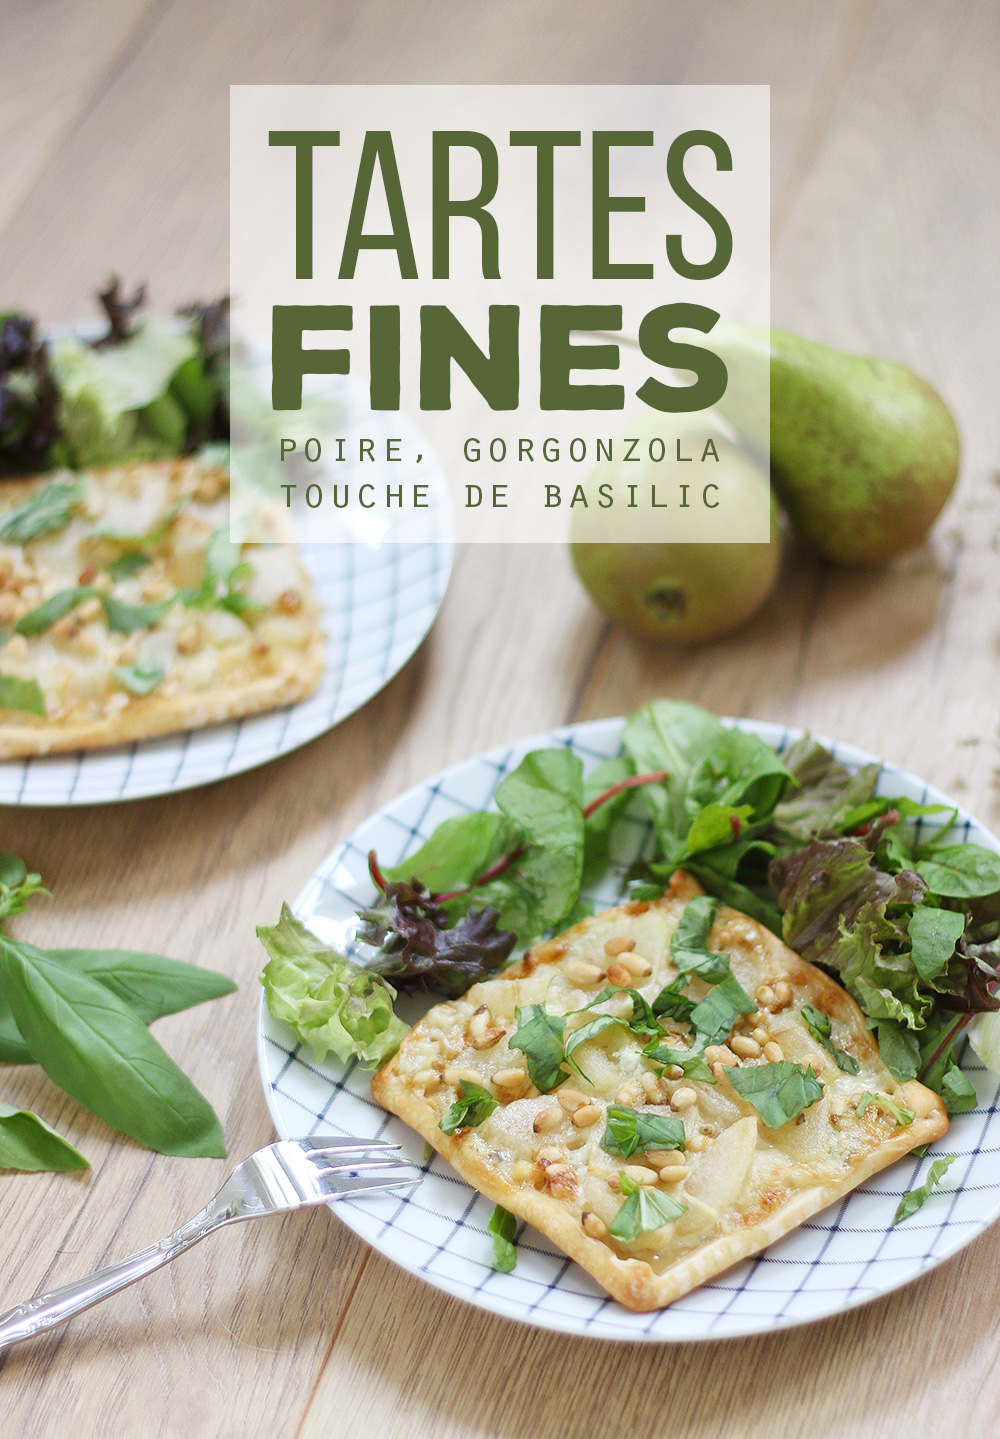 Tartelettes fines poire, gorgonzola & basilic - Mango & Salt